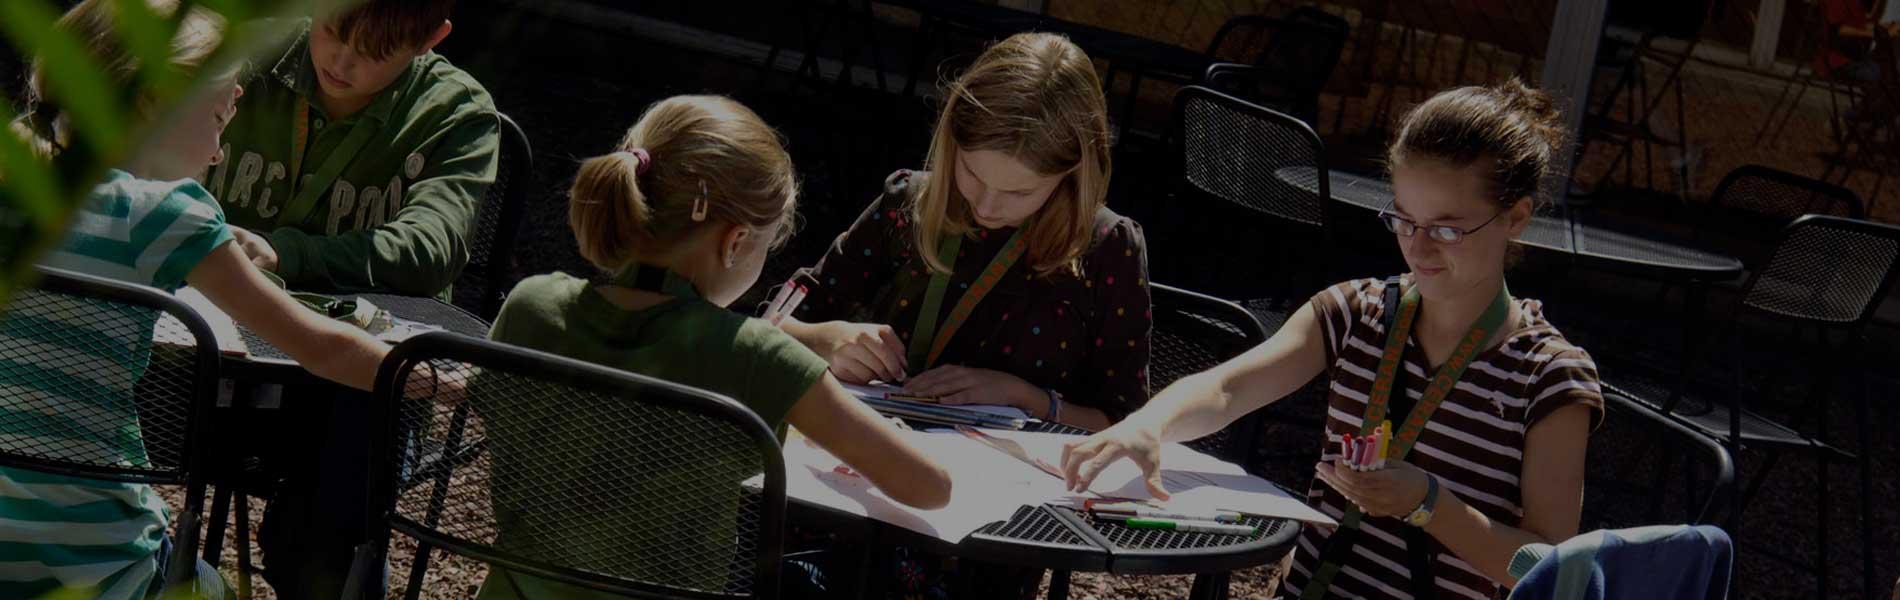 Programas de inmersión lingüística para niños